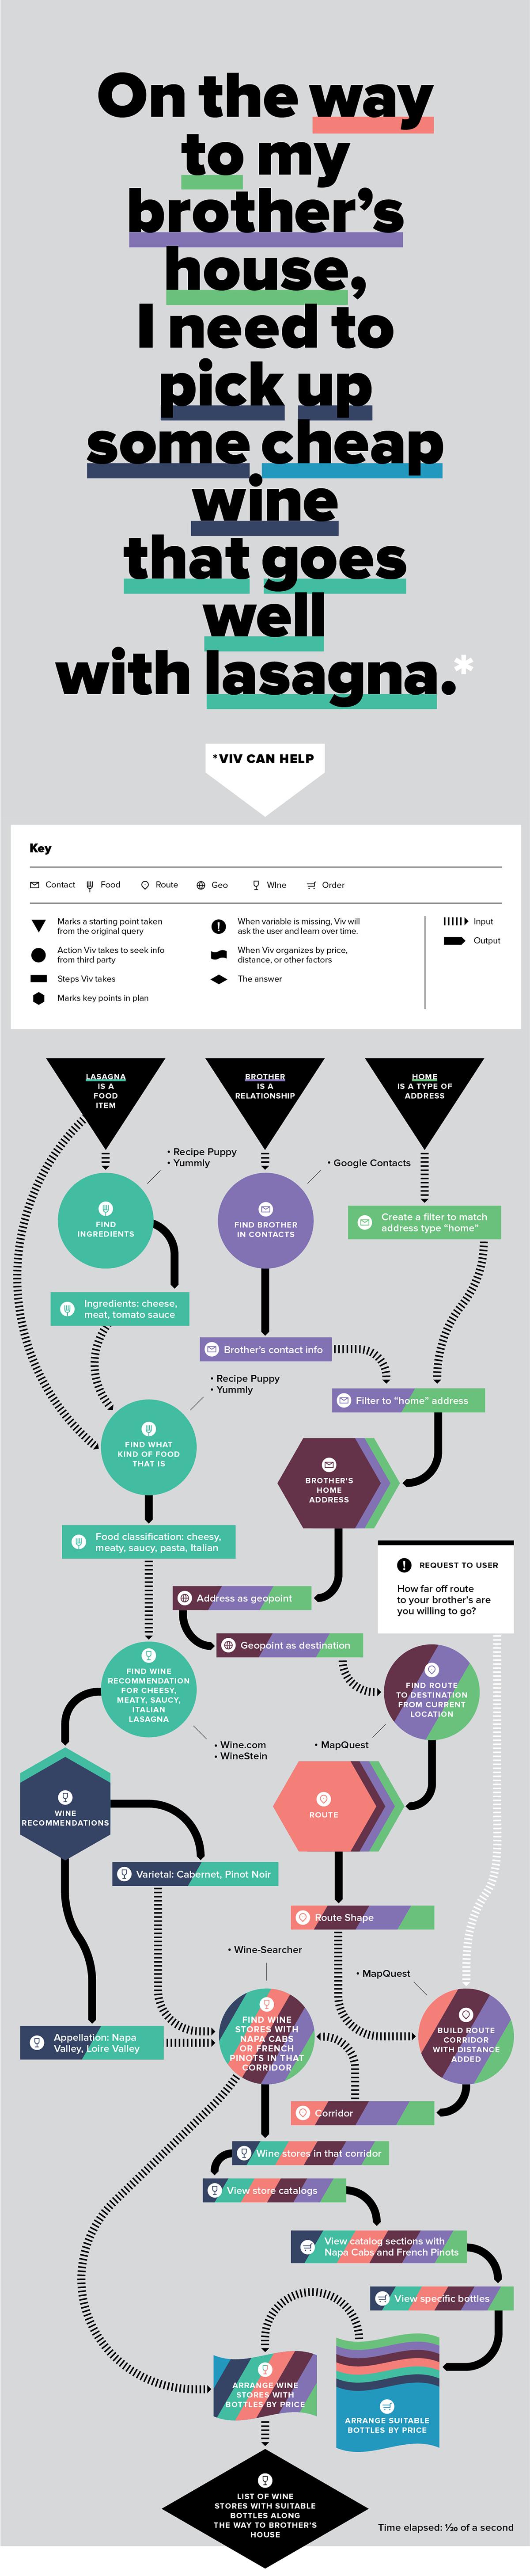 Samsung acquires Viv Labs- How Viv Works